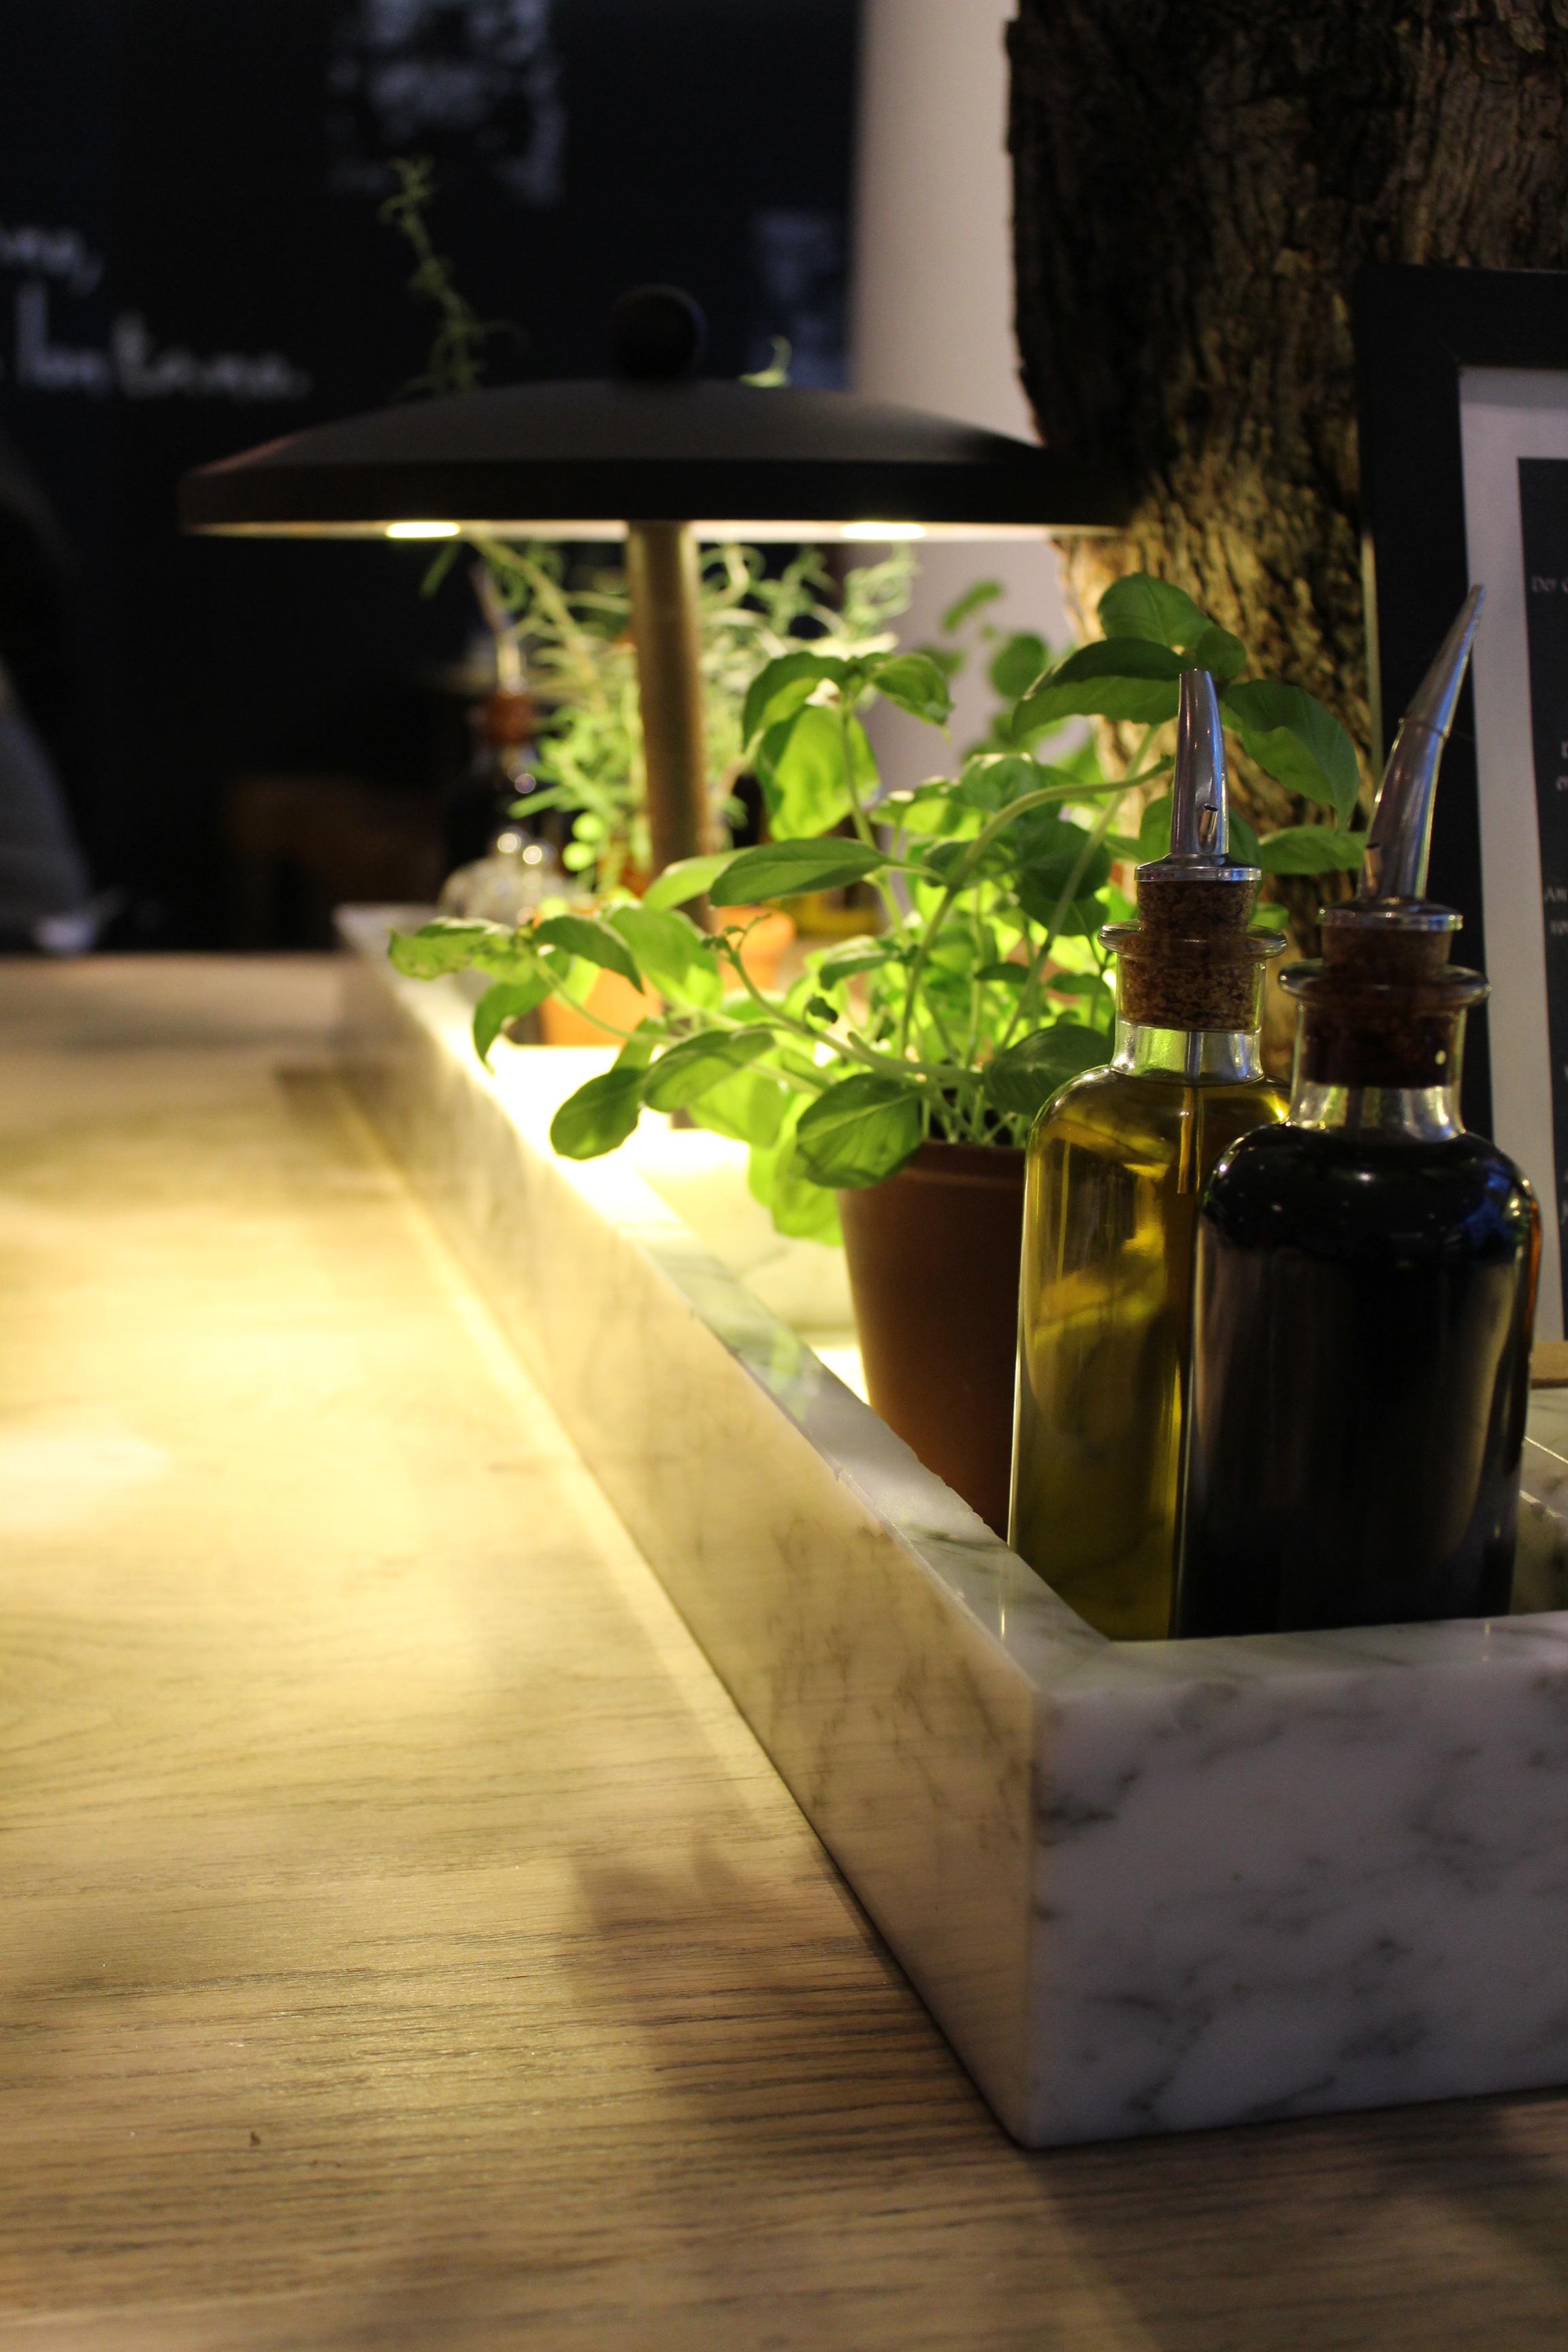 Kostenlose Foto Tabelle Pflanze Holz Blume Fruhling Grun